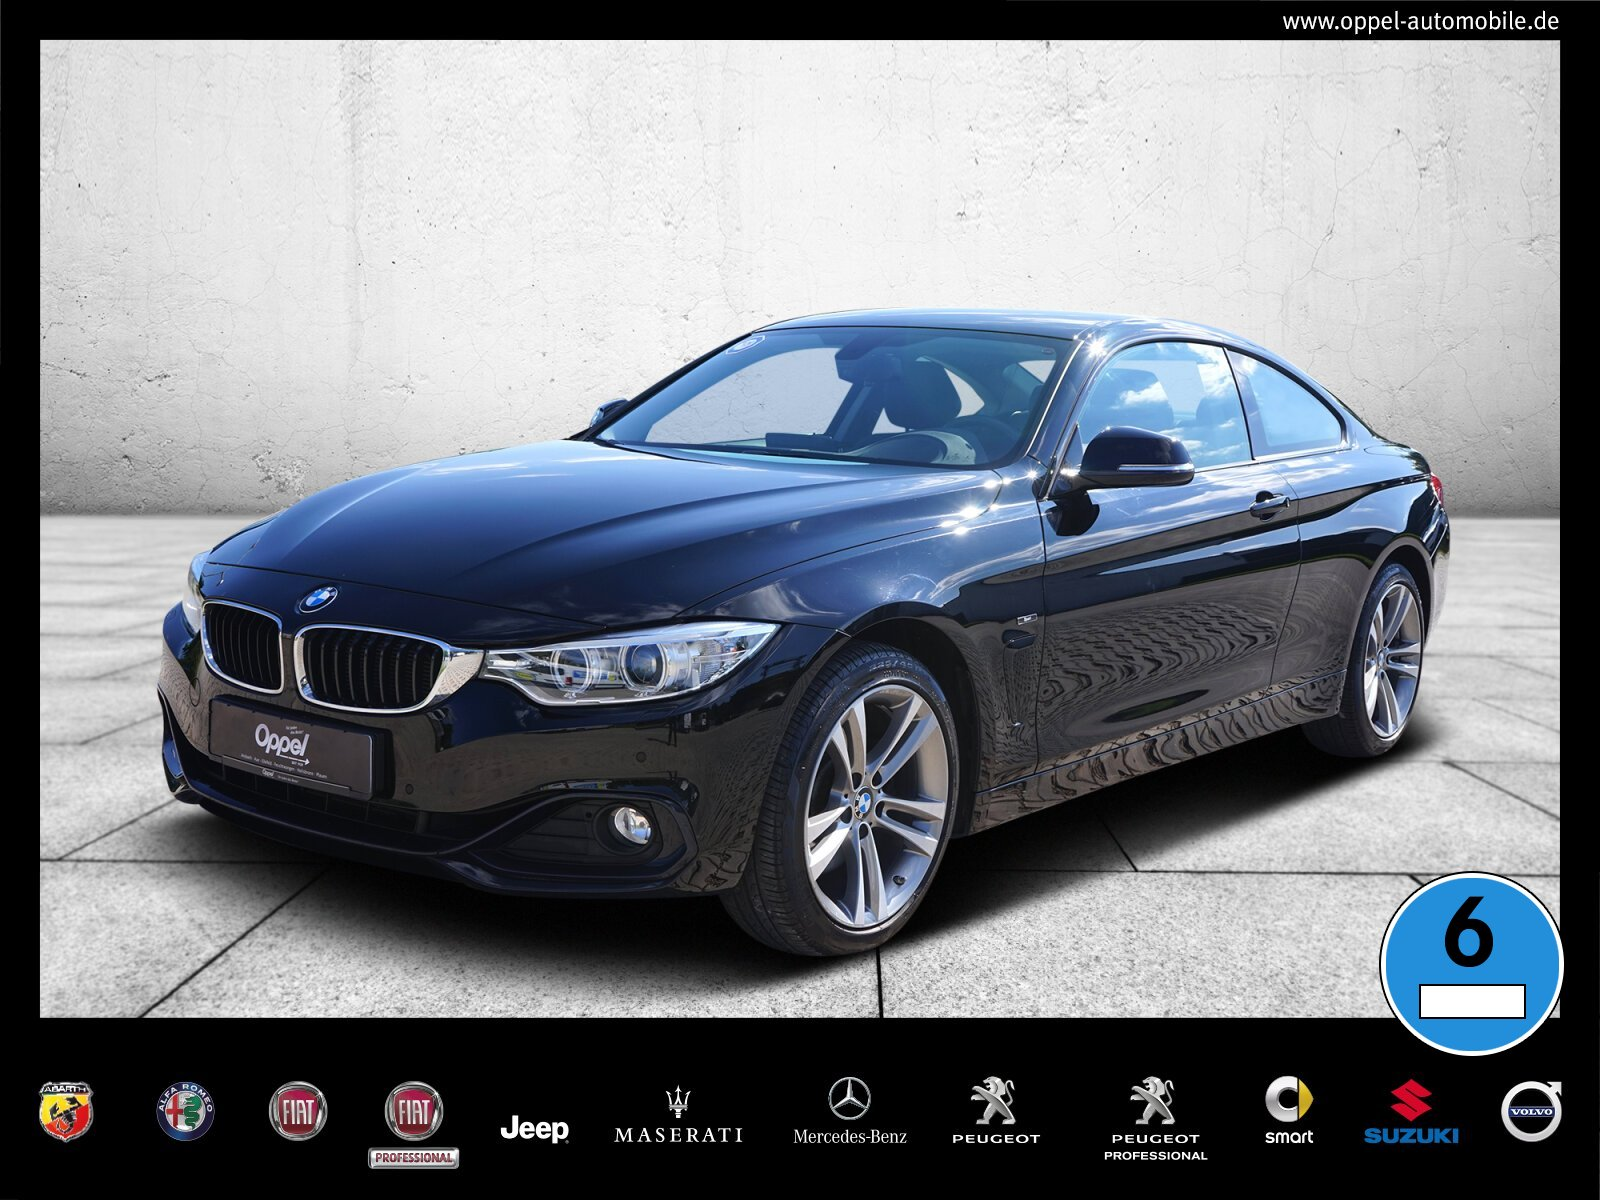 BMW 428i xDrive SPORT LINE+NAVI+AUTOM.+KAMERA+XENON+, Jahr 2014, Benzin